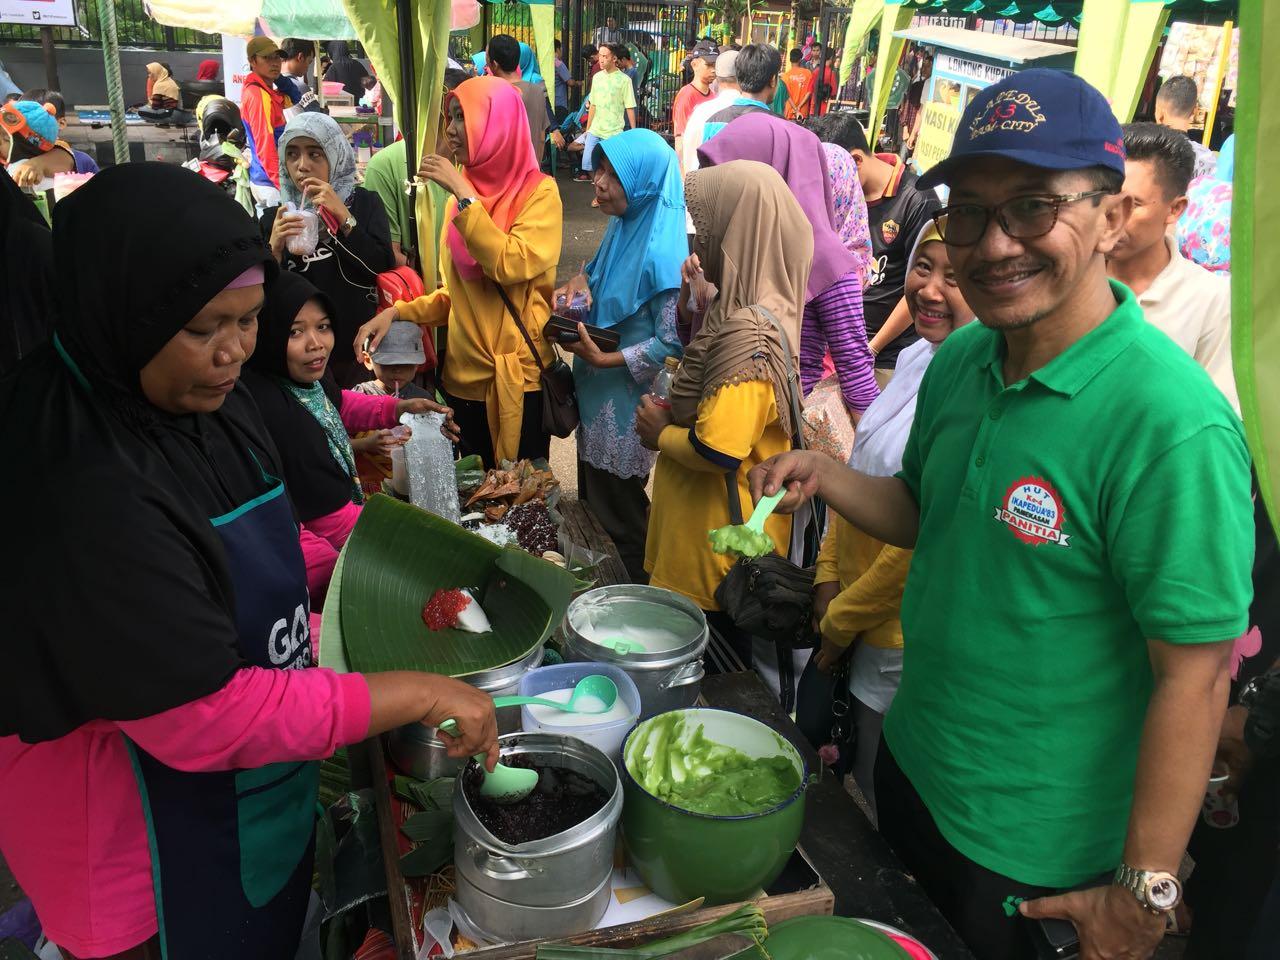 Deadline Deklarasi Parpol Pengusung Kh Kholilurrahman Sebagai Cabub Mendatangi Pkl